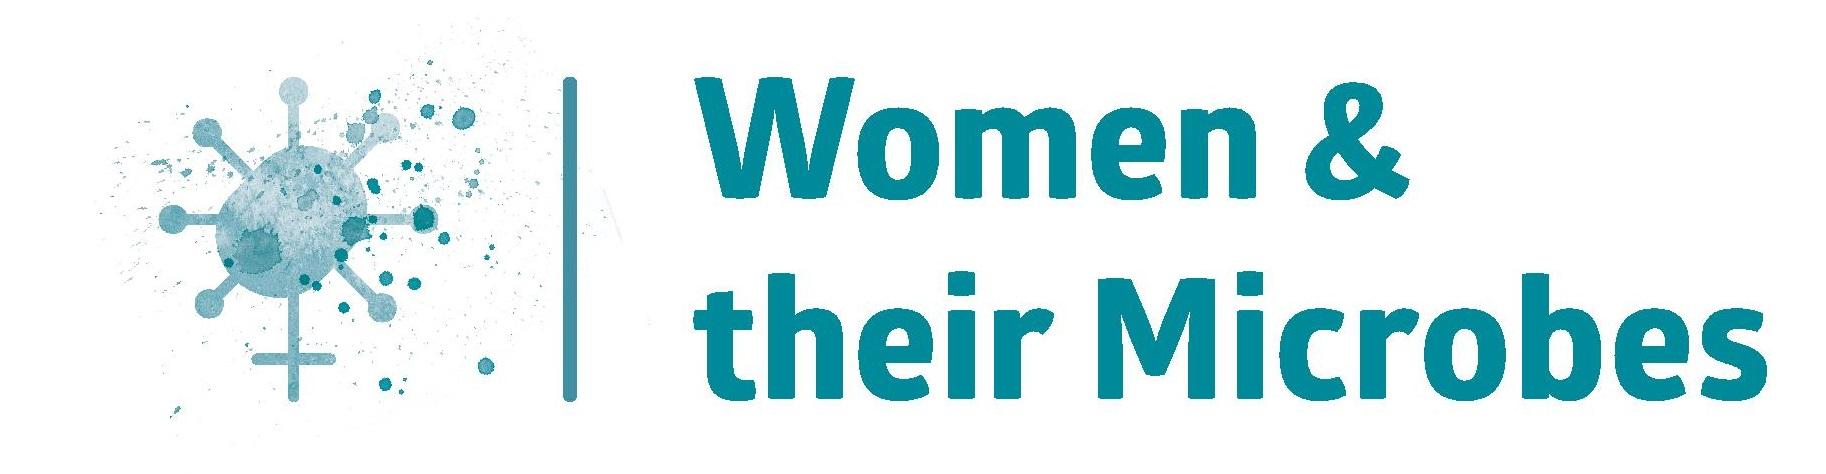 Women & their Microbes Logo